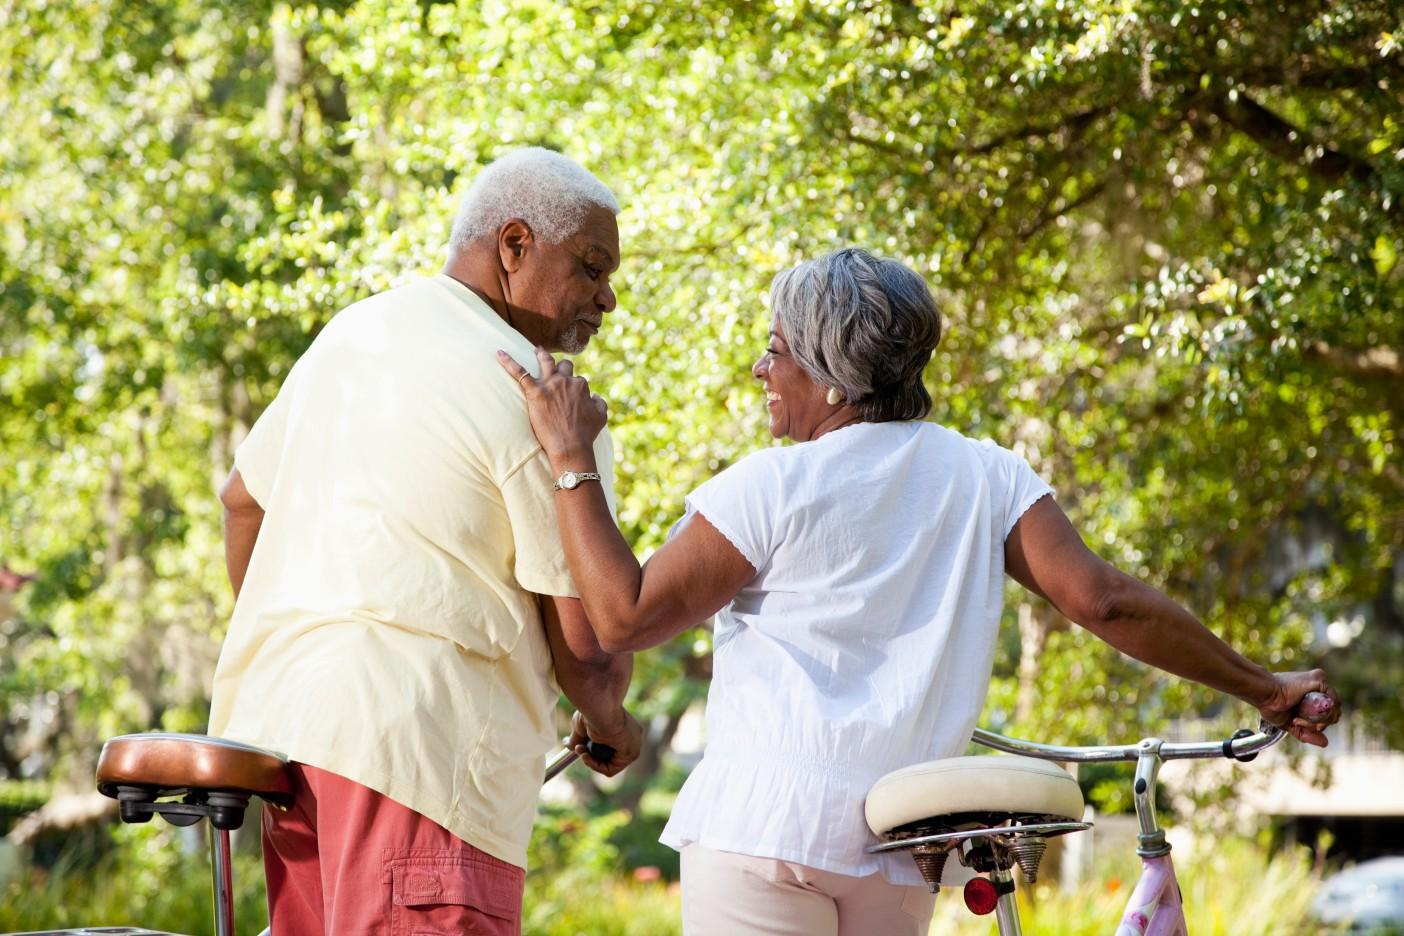 magas vérnyomás a magas vérnyomás okai lehetséges-e magas vérnyomás esetén nizizni